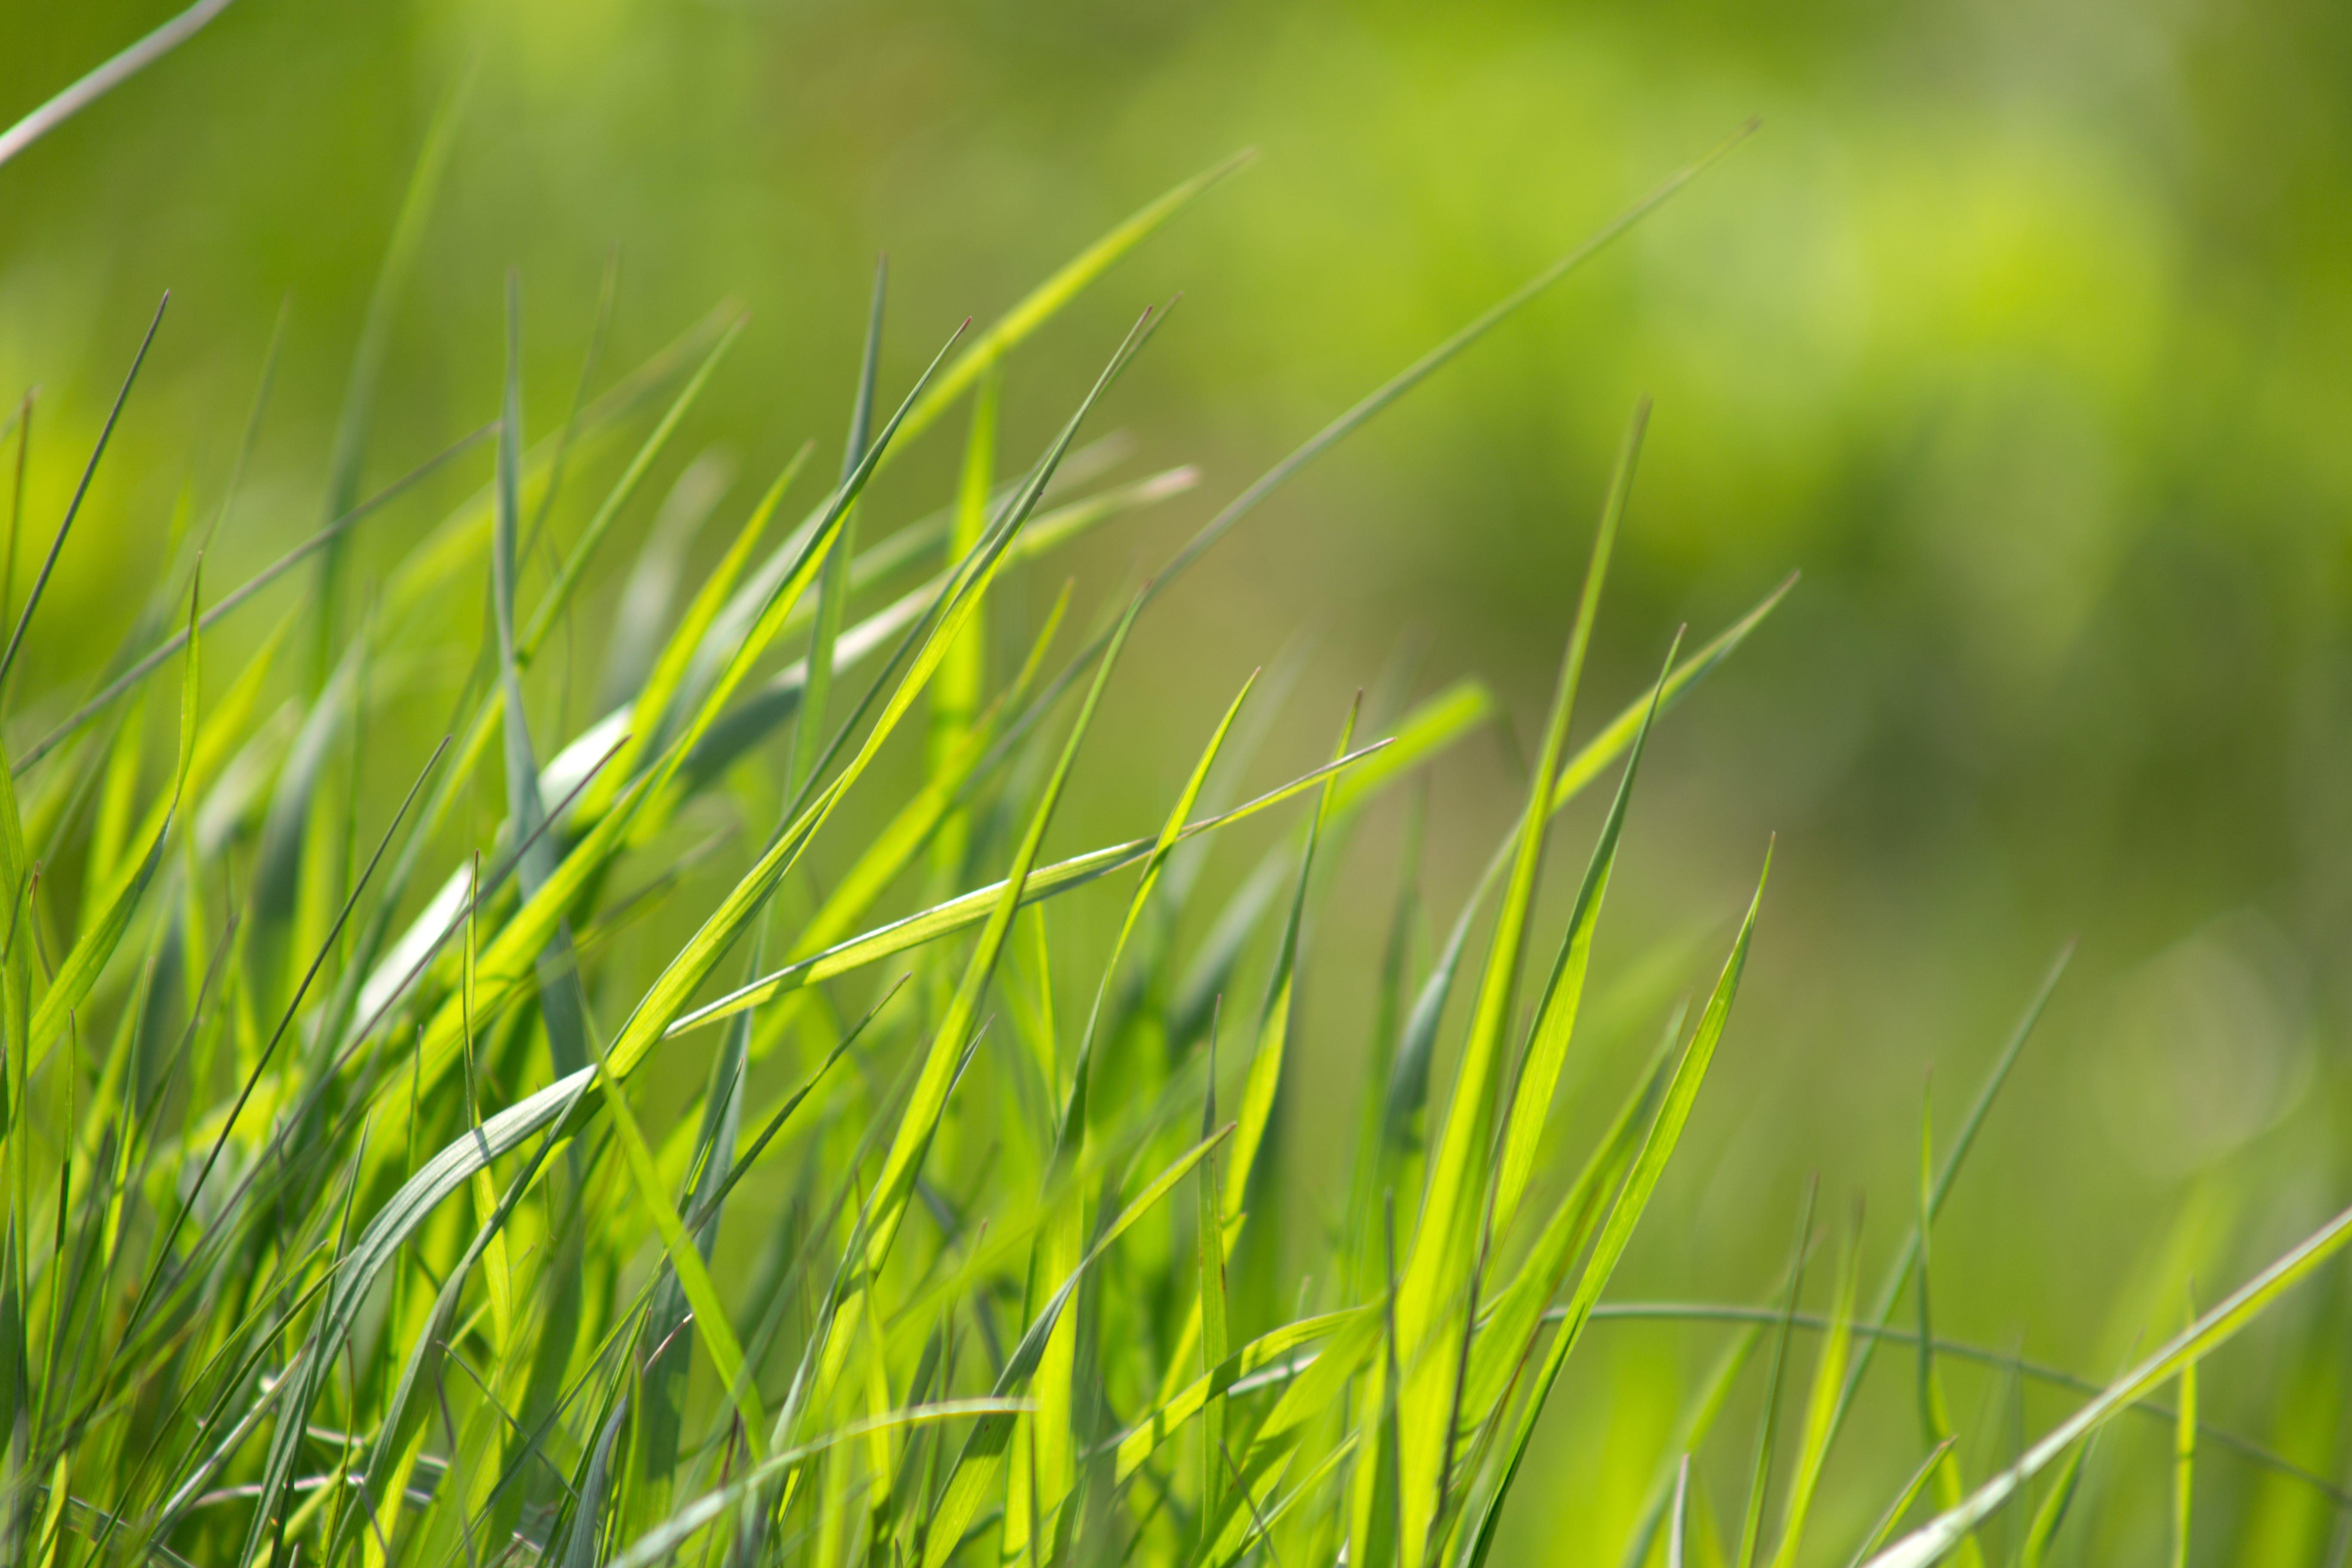 blur, close-up, depth of field